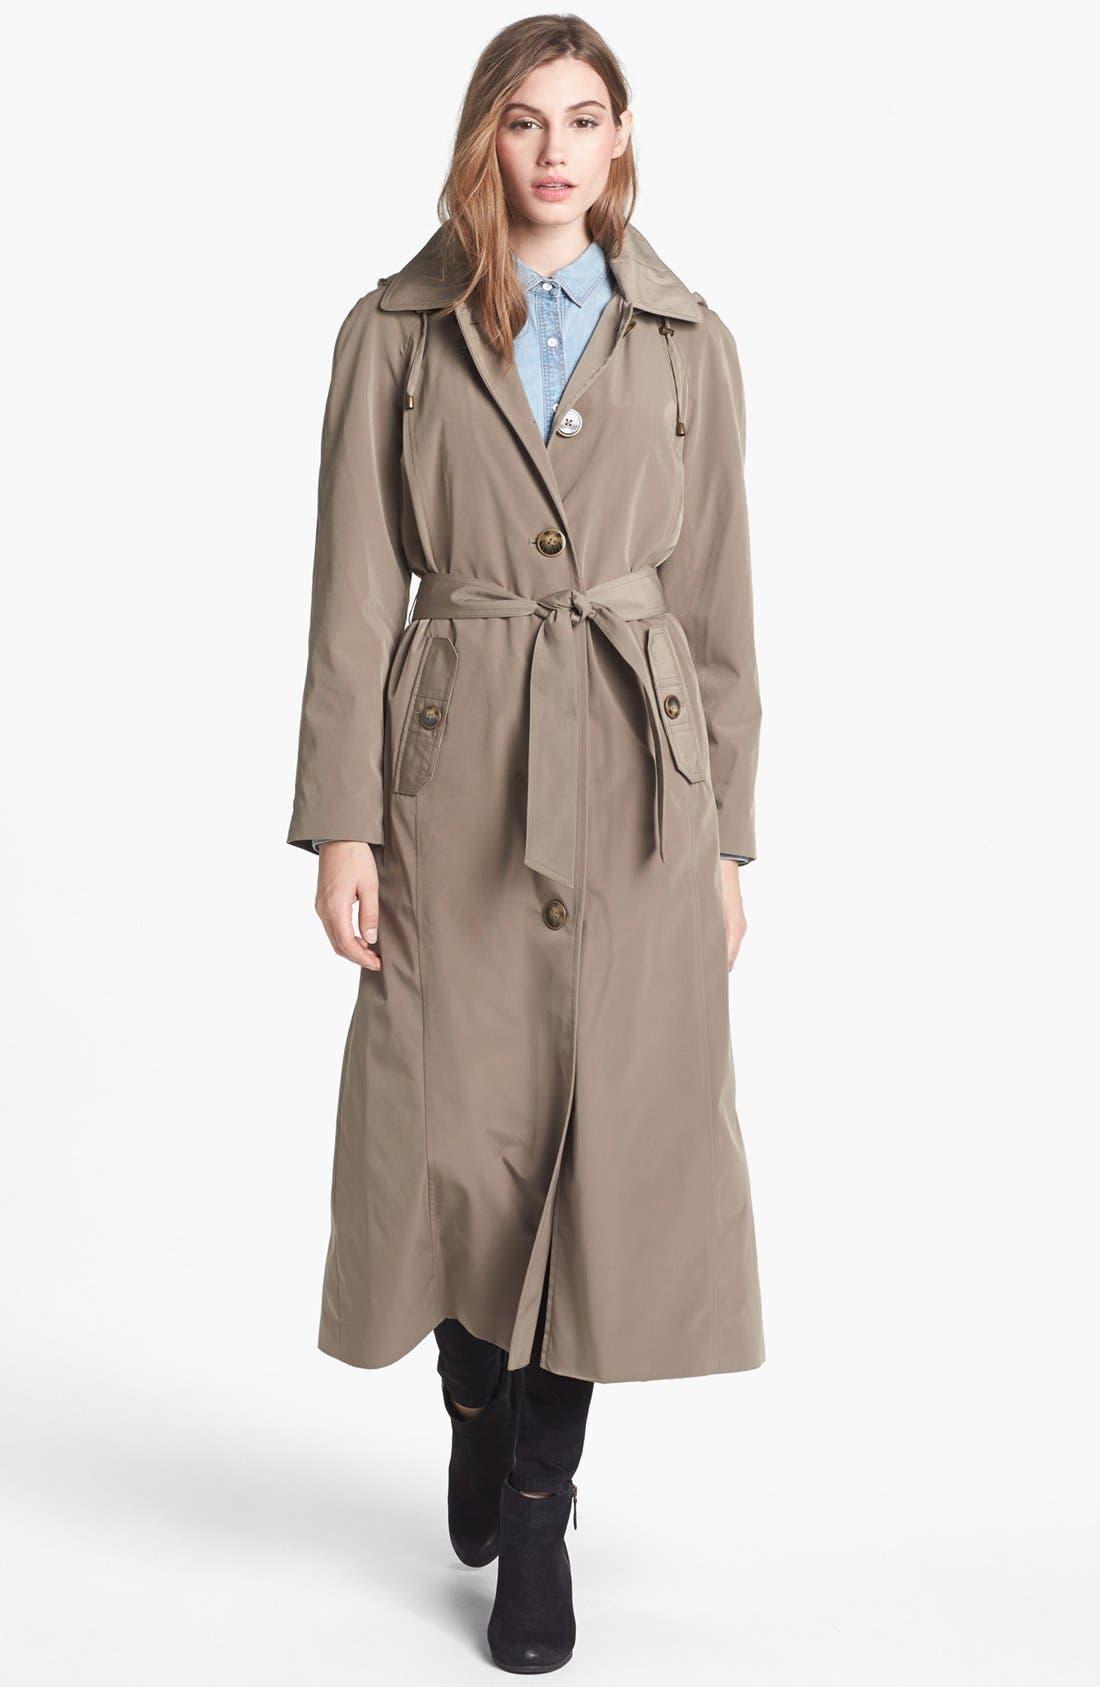 Alternate Image 1 Selected - London Fog Long Trench Coat with Detachable Hood & Liner (Regular & Petite)